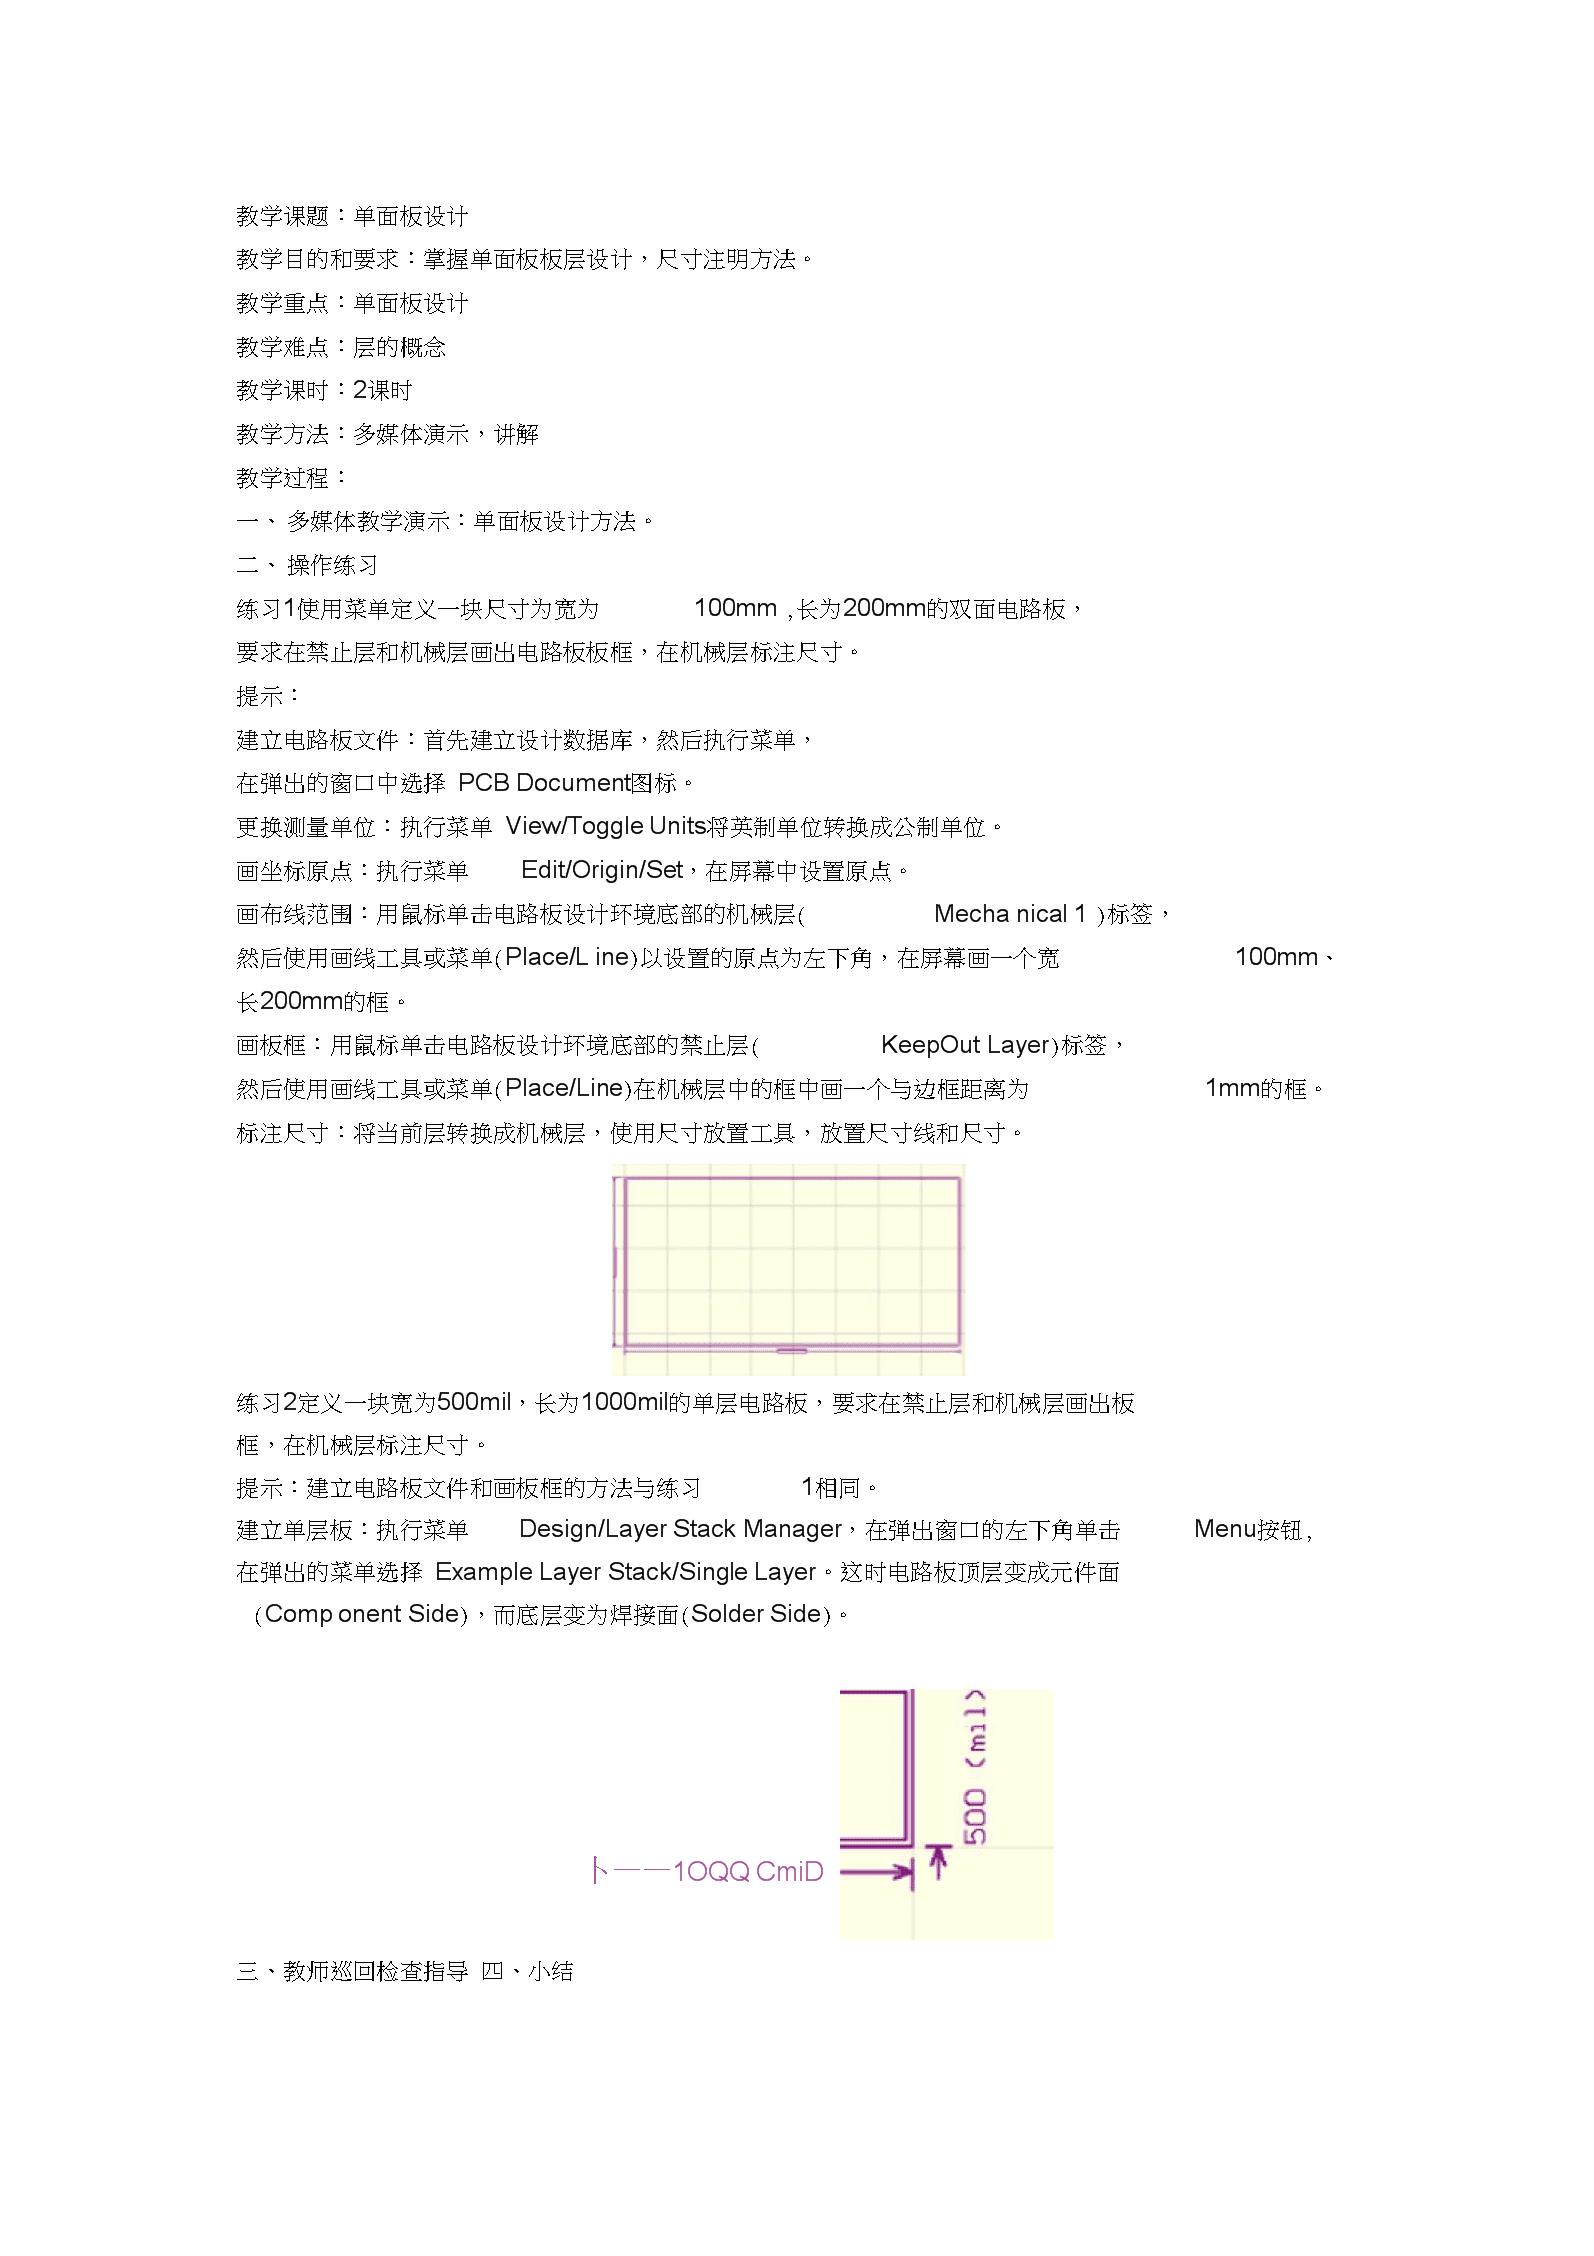 教学课题PCB设计.docx